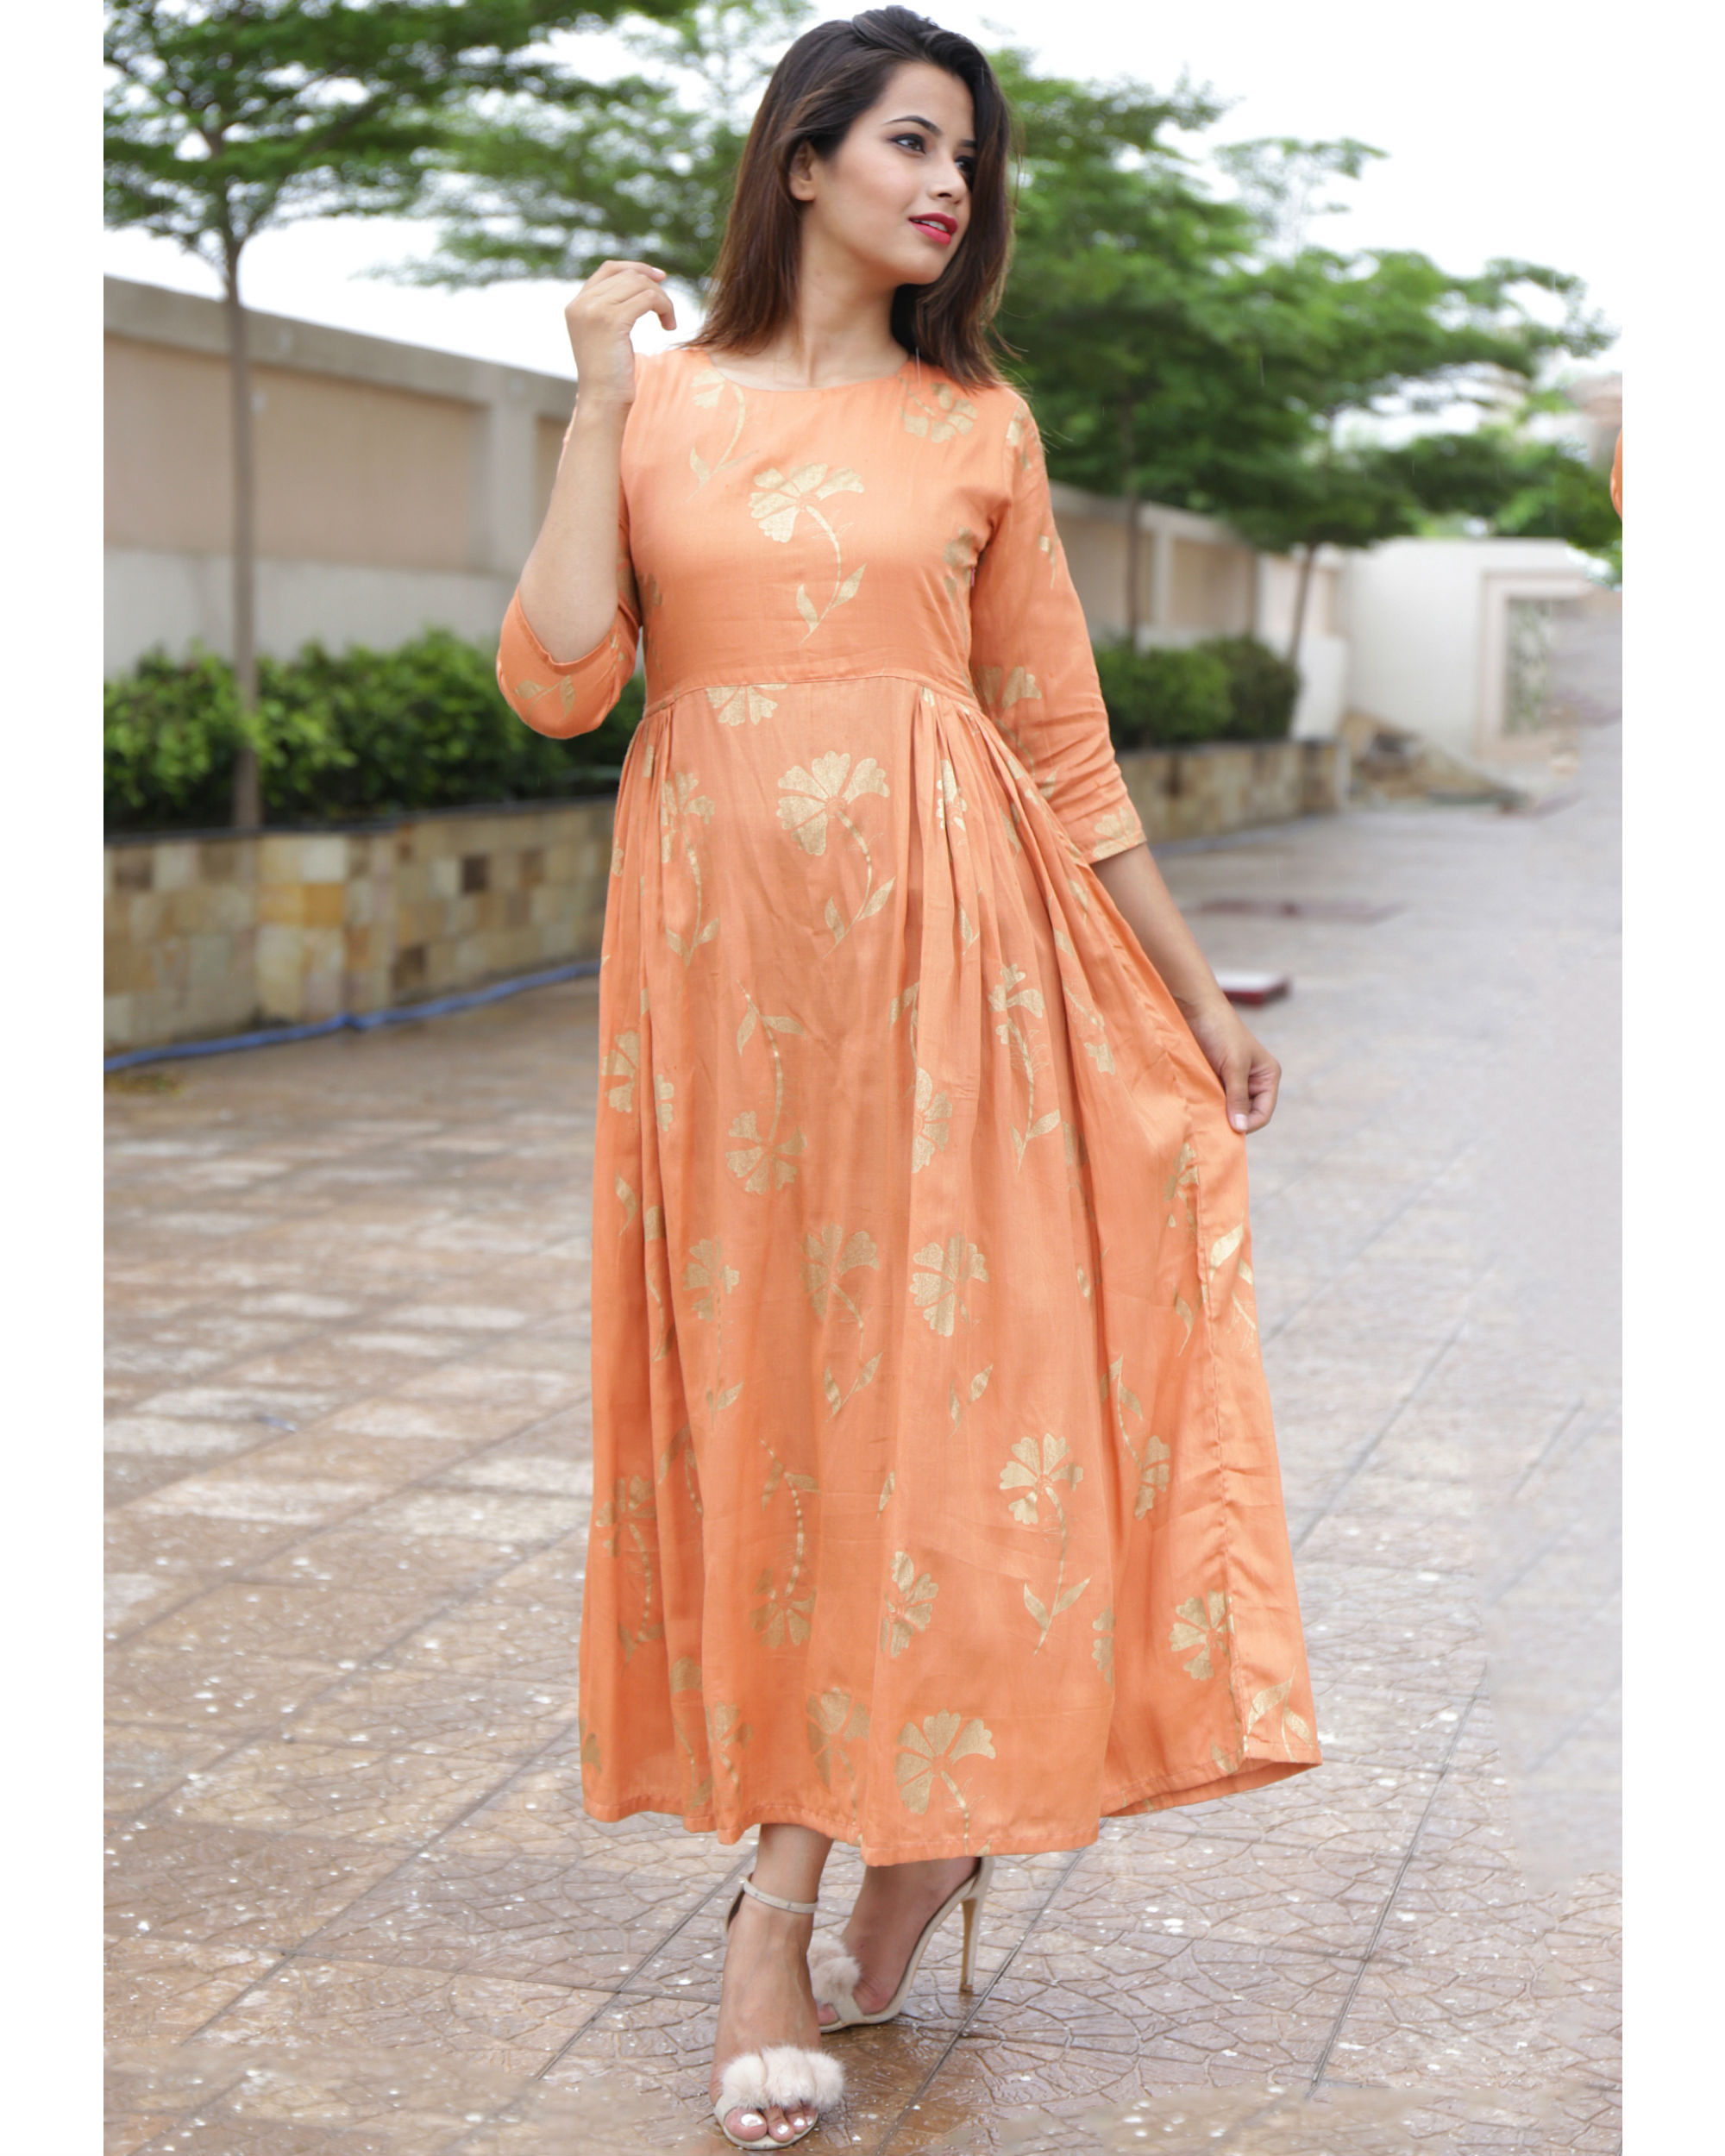 Tangerine foil printed dress